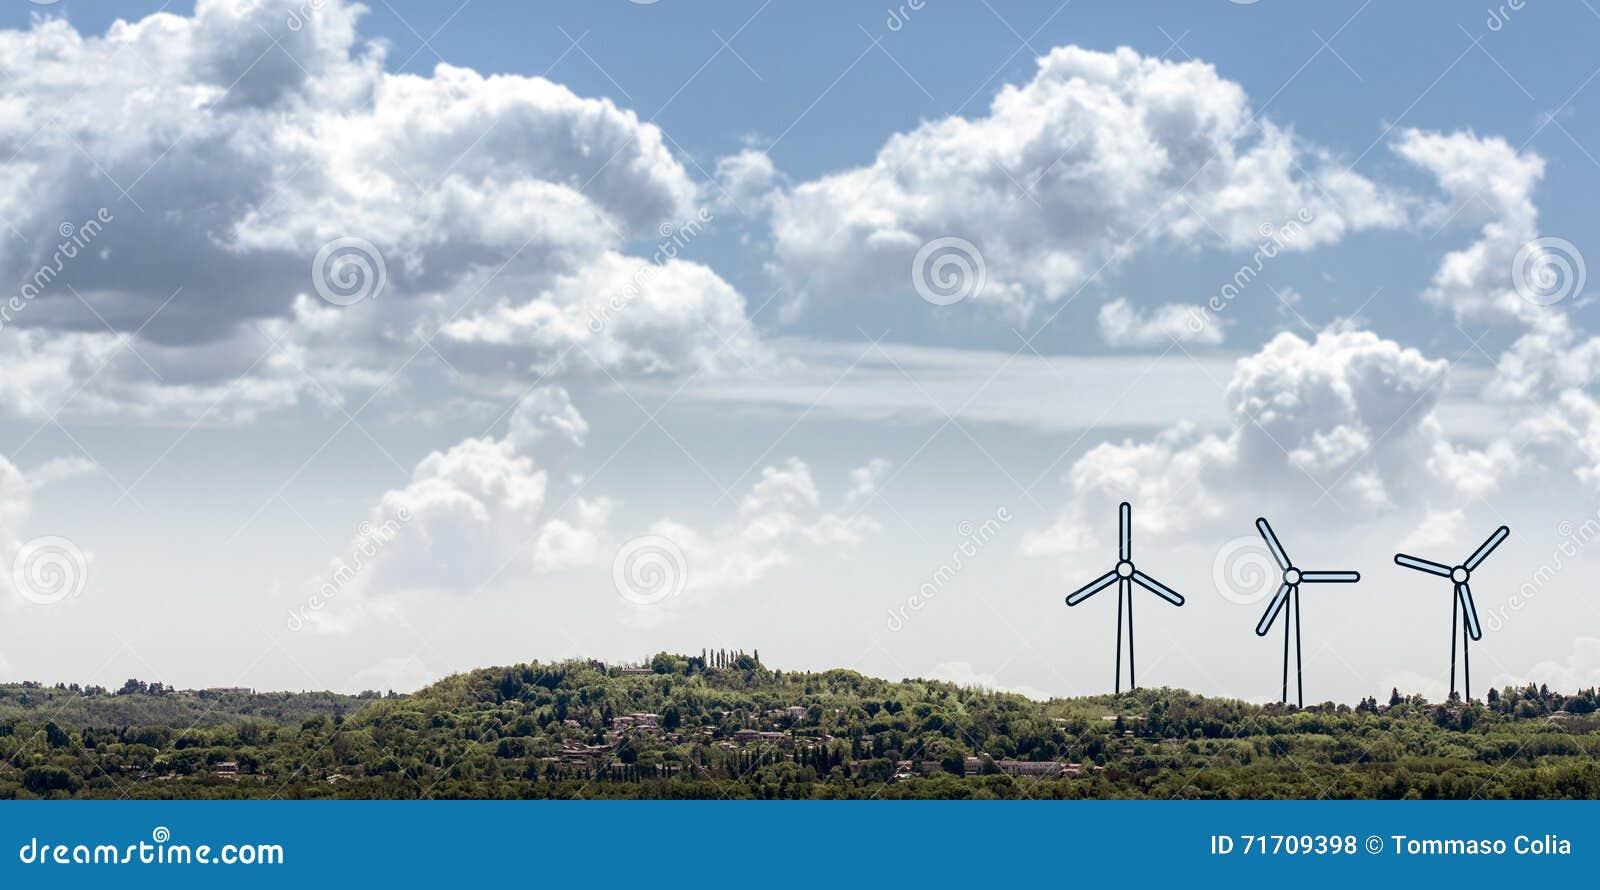 Energy efficiency concepts